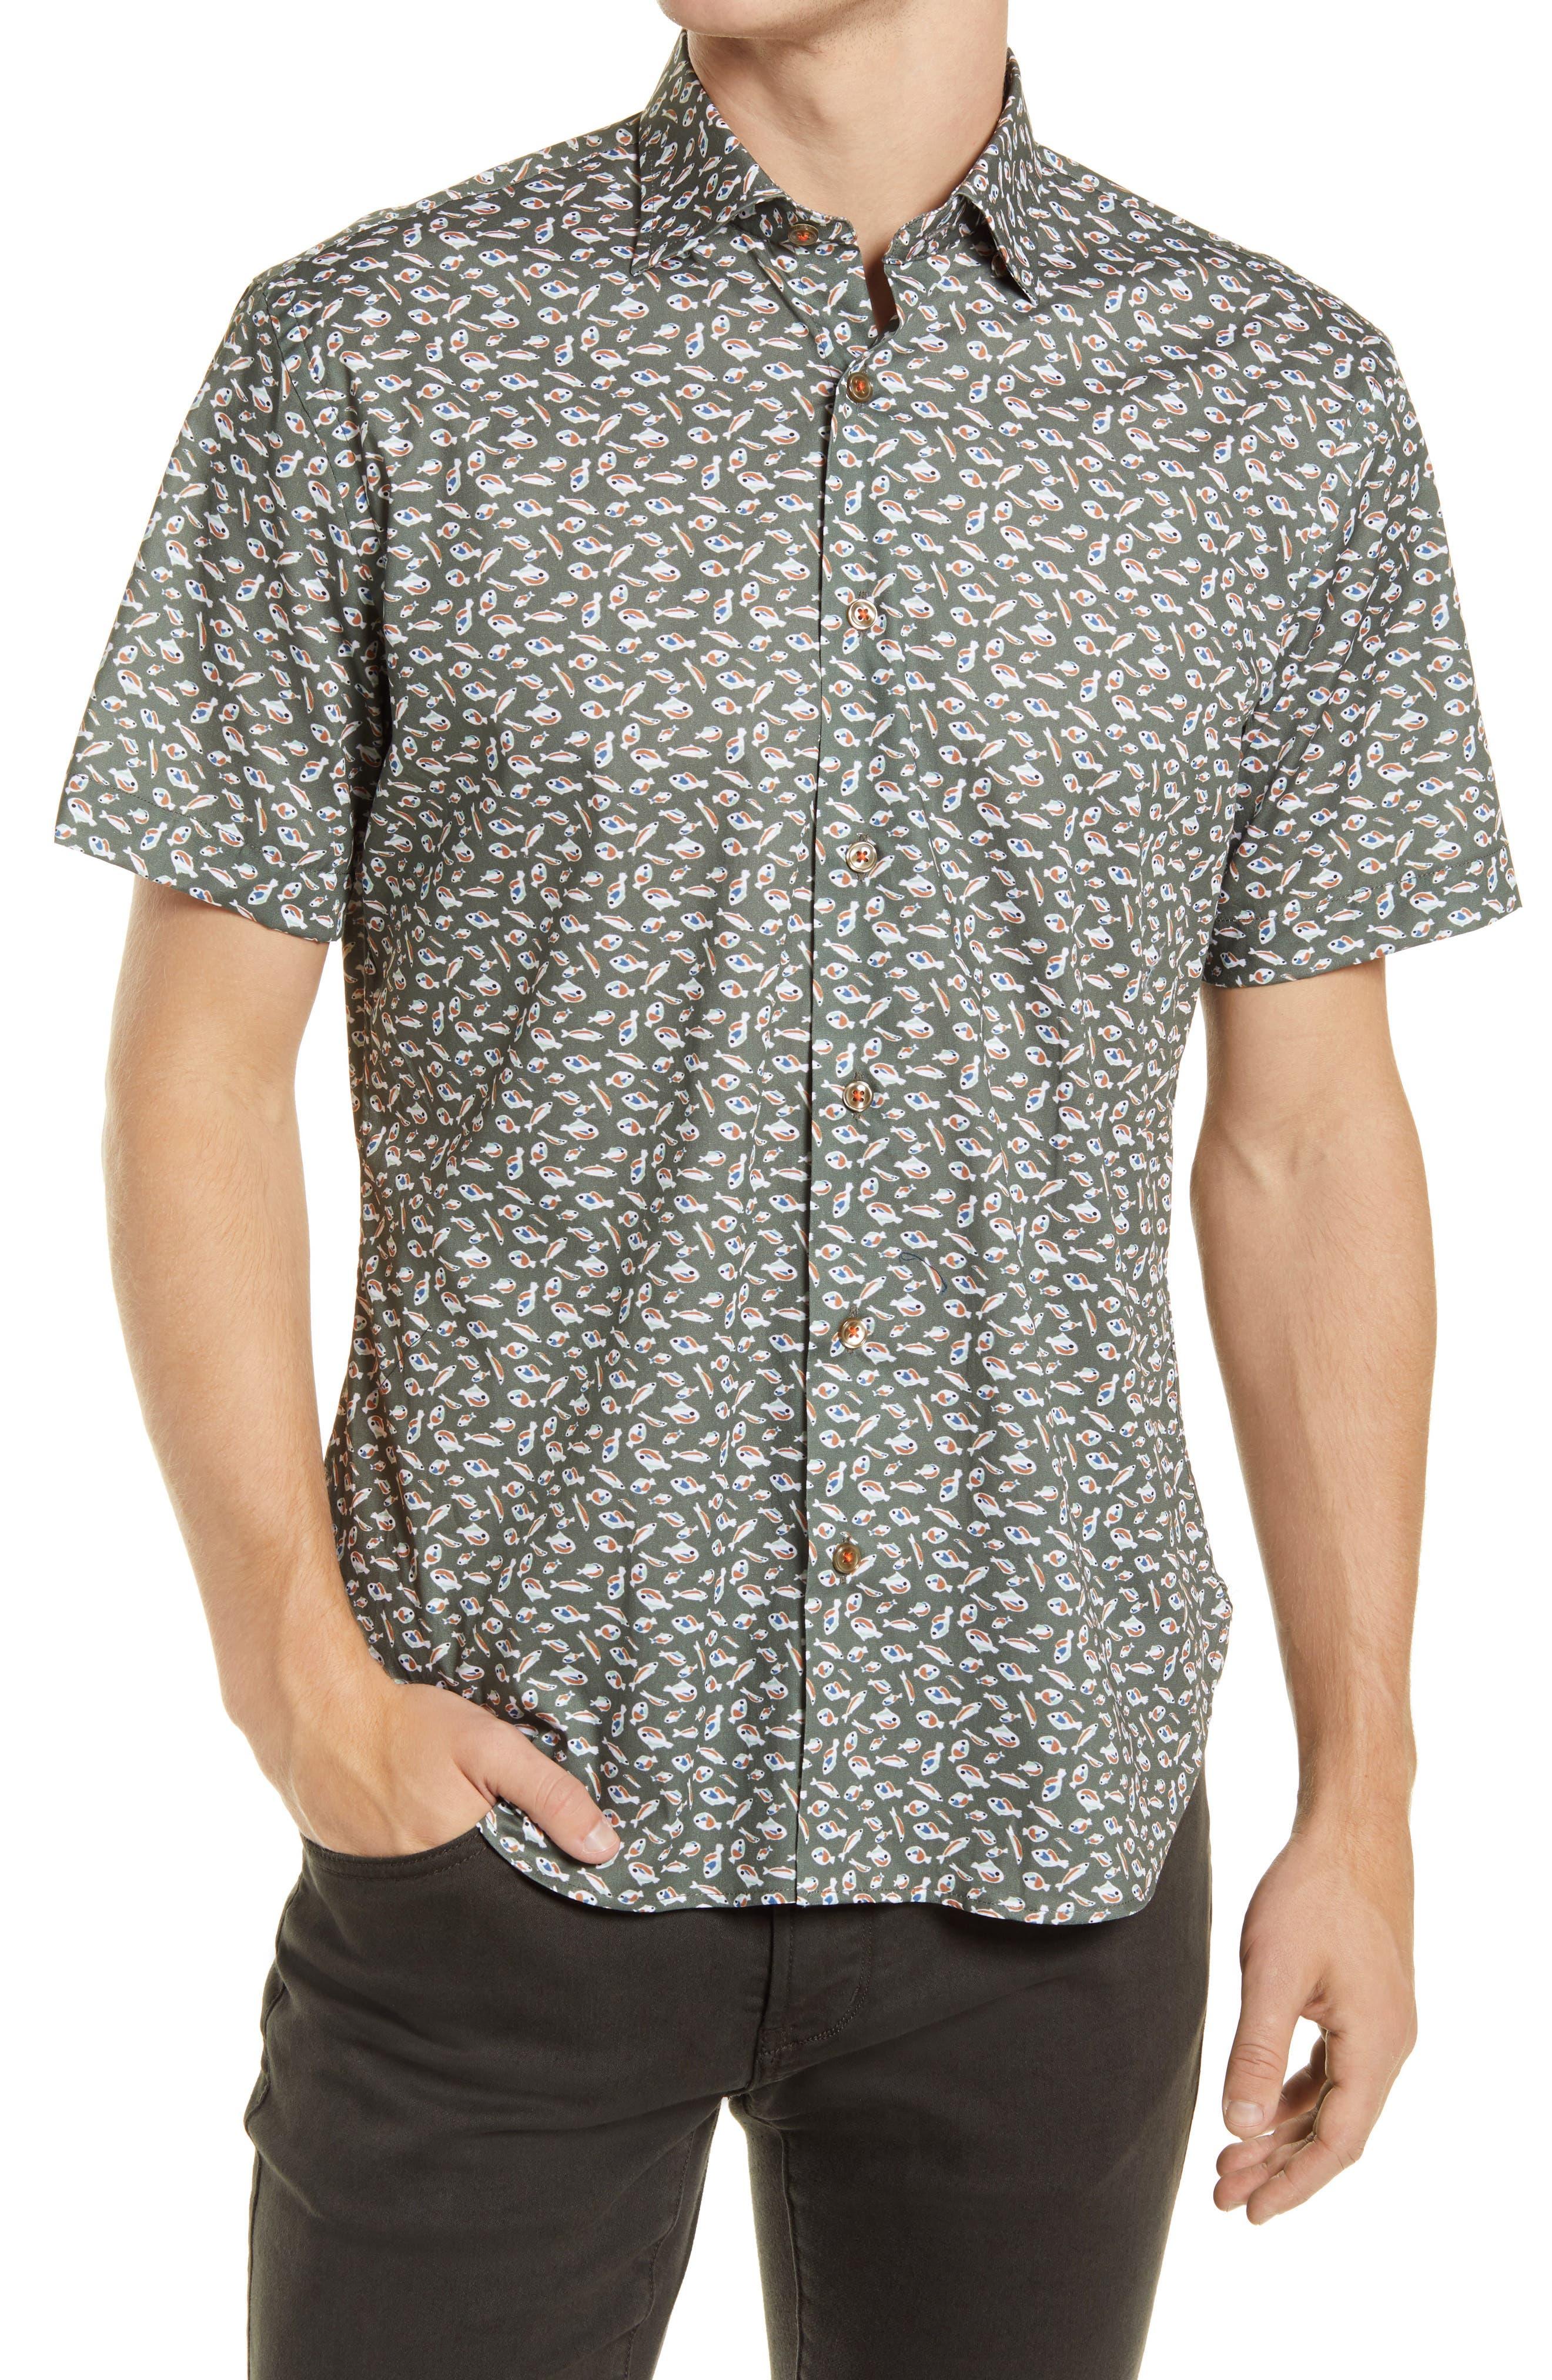 Something Fishy Short Sleeve Stretch Button-Up Shirt